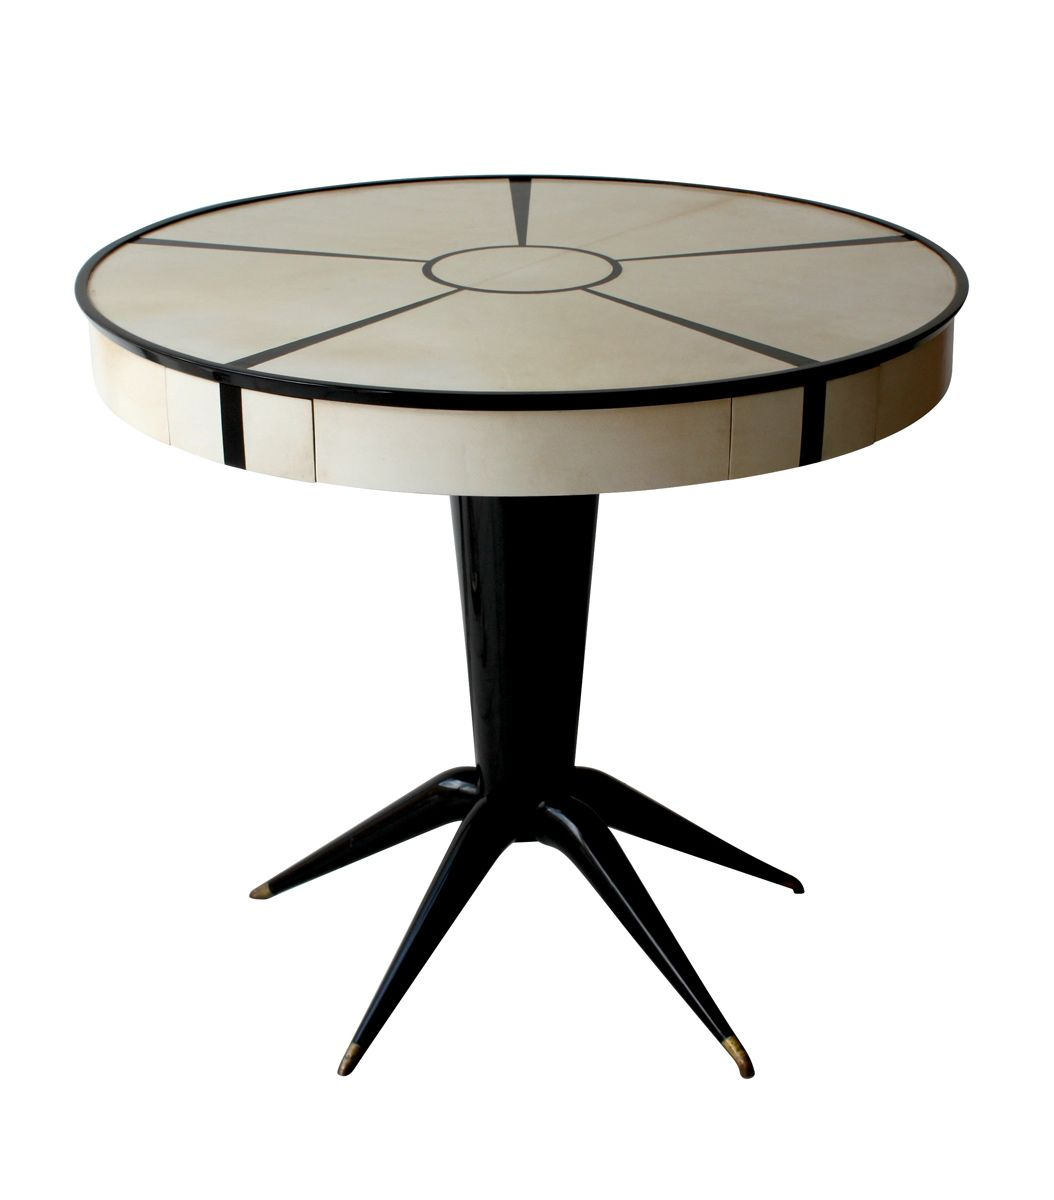 Arredamento Da Giardino Parma.Gio Ponti Games Table De Parma Arredamento